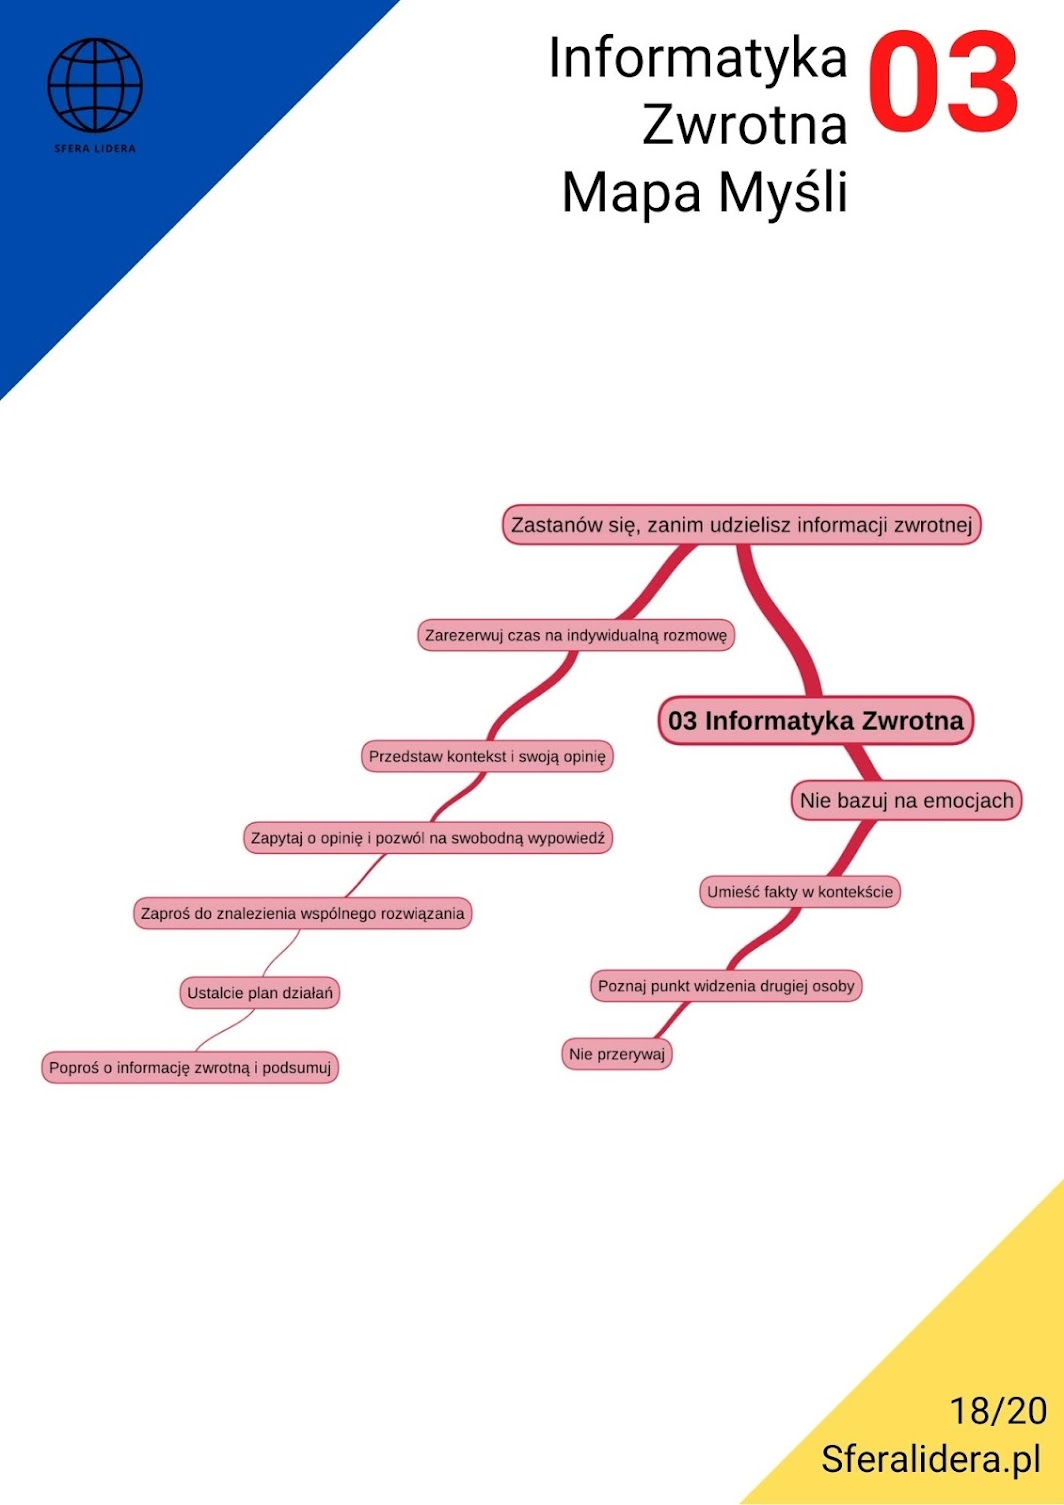 Informatyka zwrotna mapa